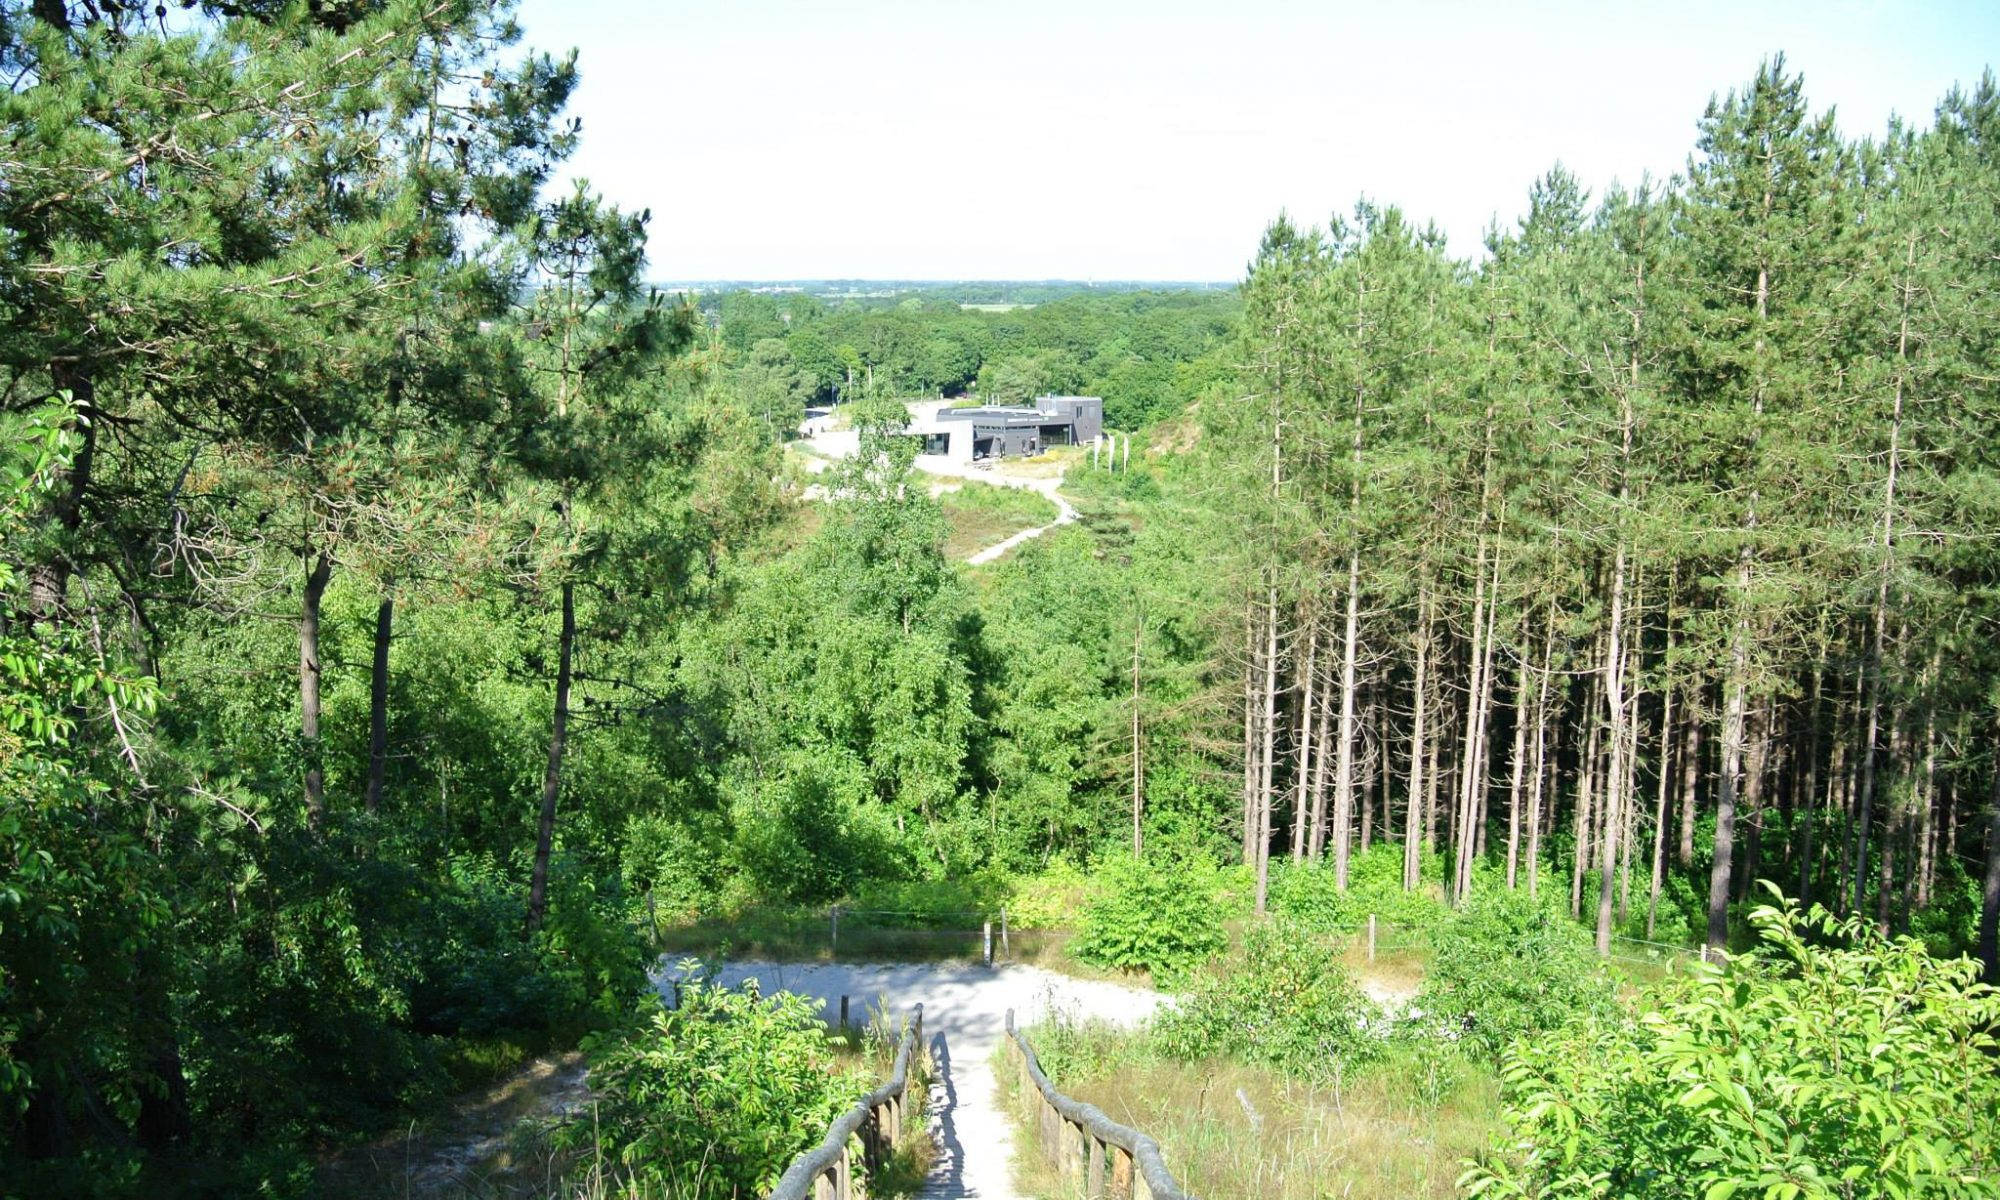 Schoorl und Umgebung - Urlaub in Nordholland